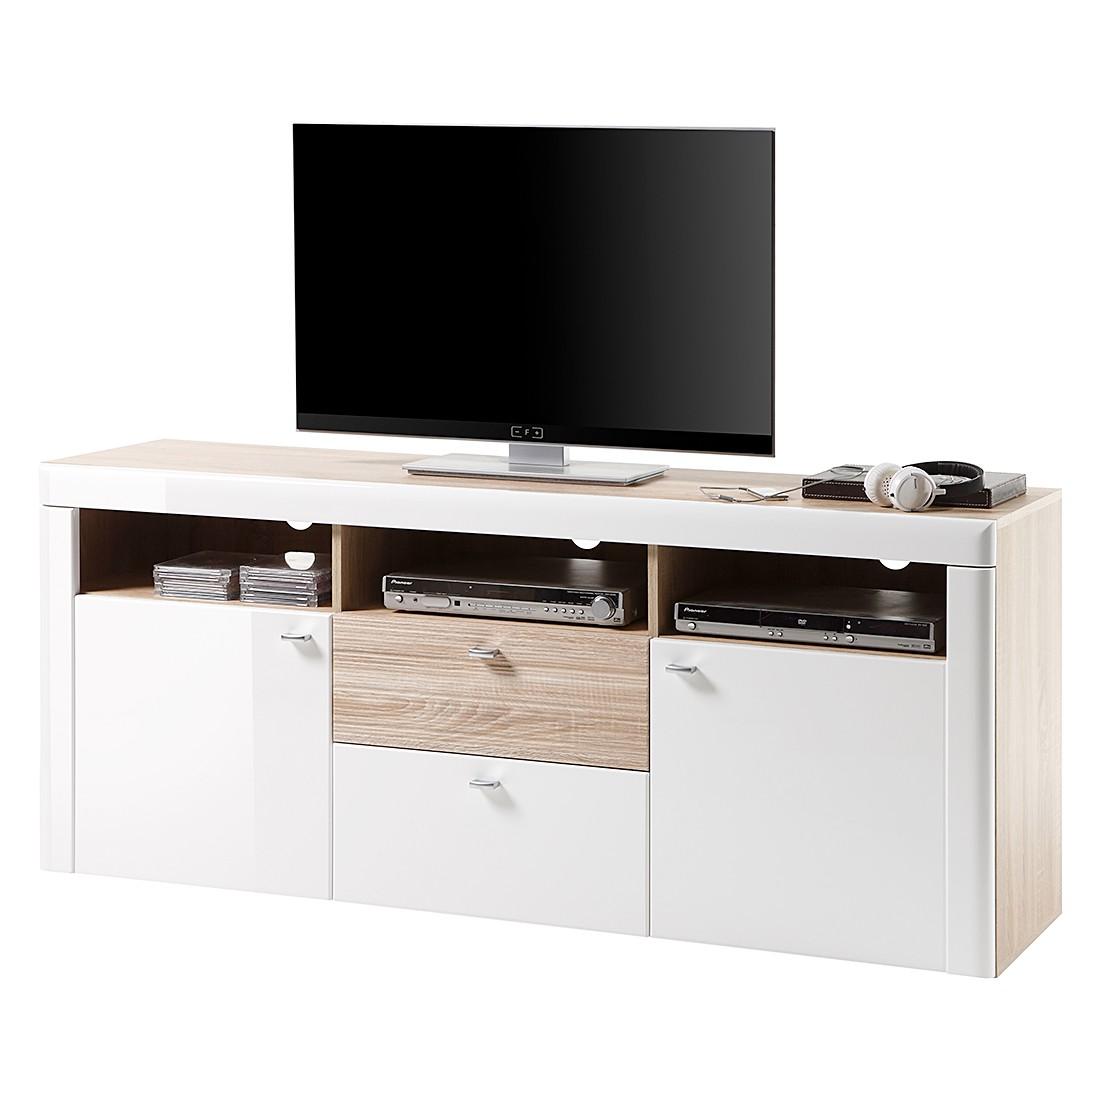 Meuble TV Telemann II - Blanc brillant / Imitation chêne de Sonoma, loftscape